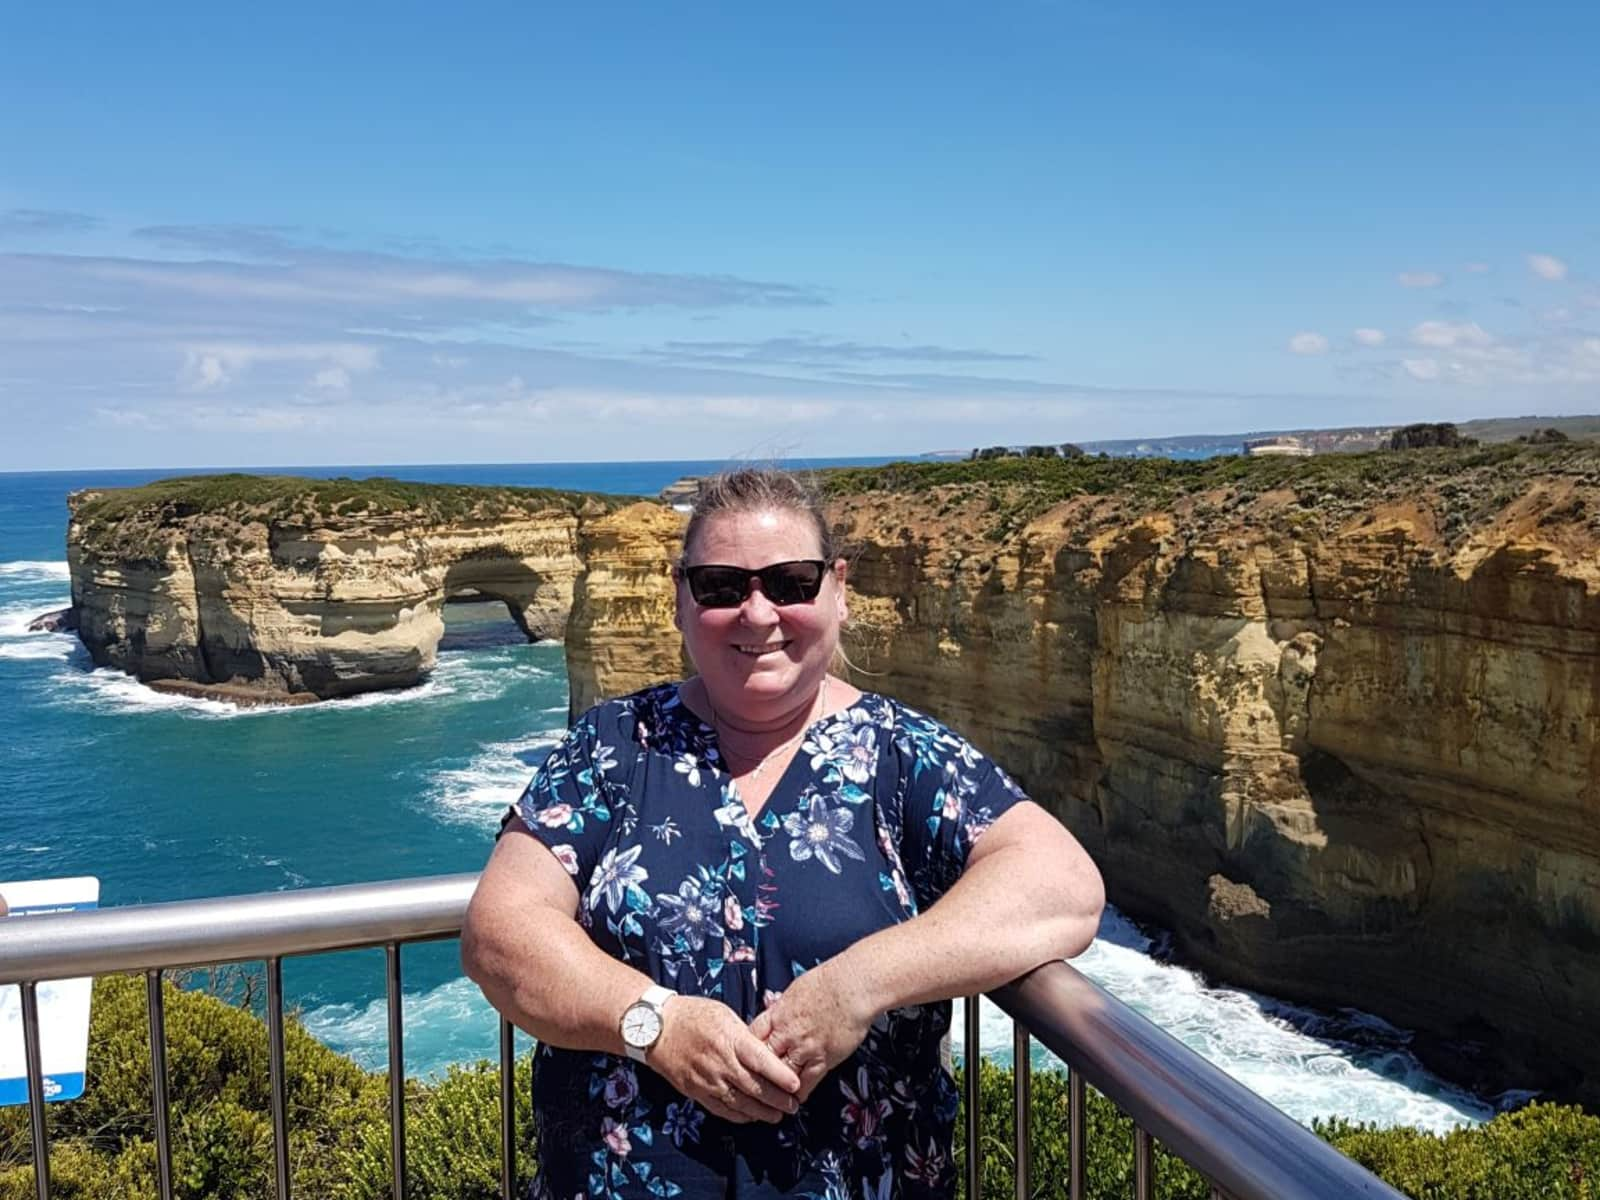 Joanna from Auckland, New Zealand